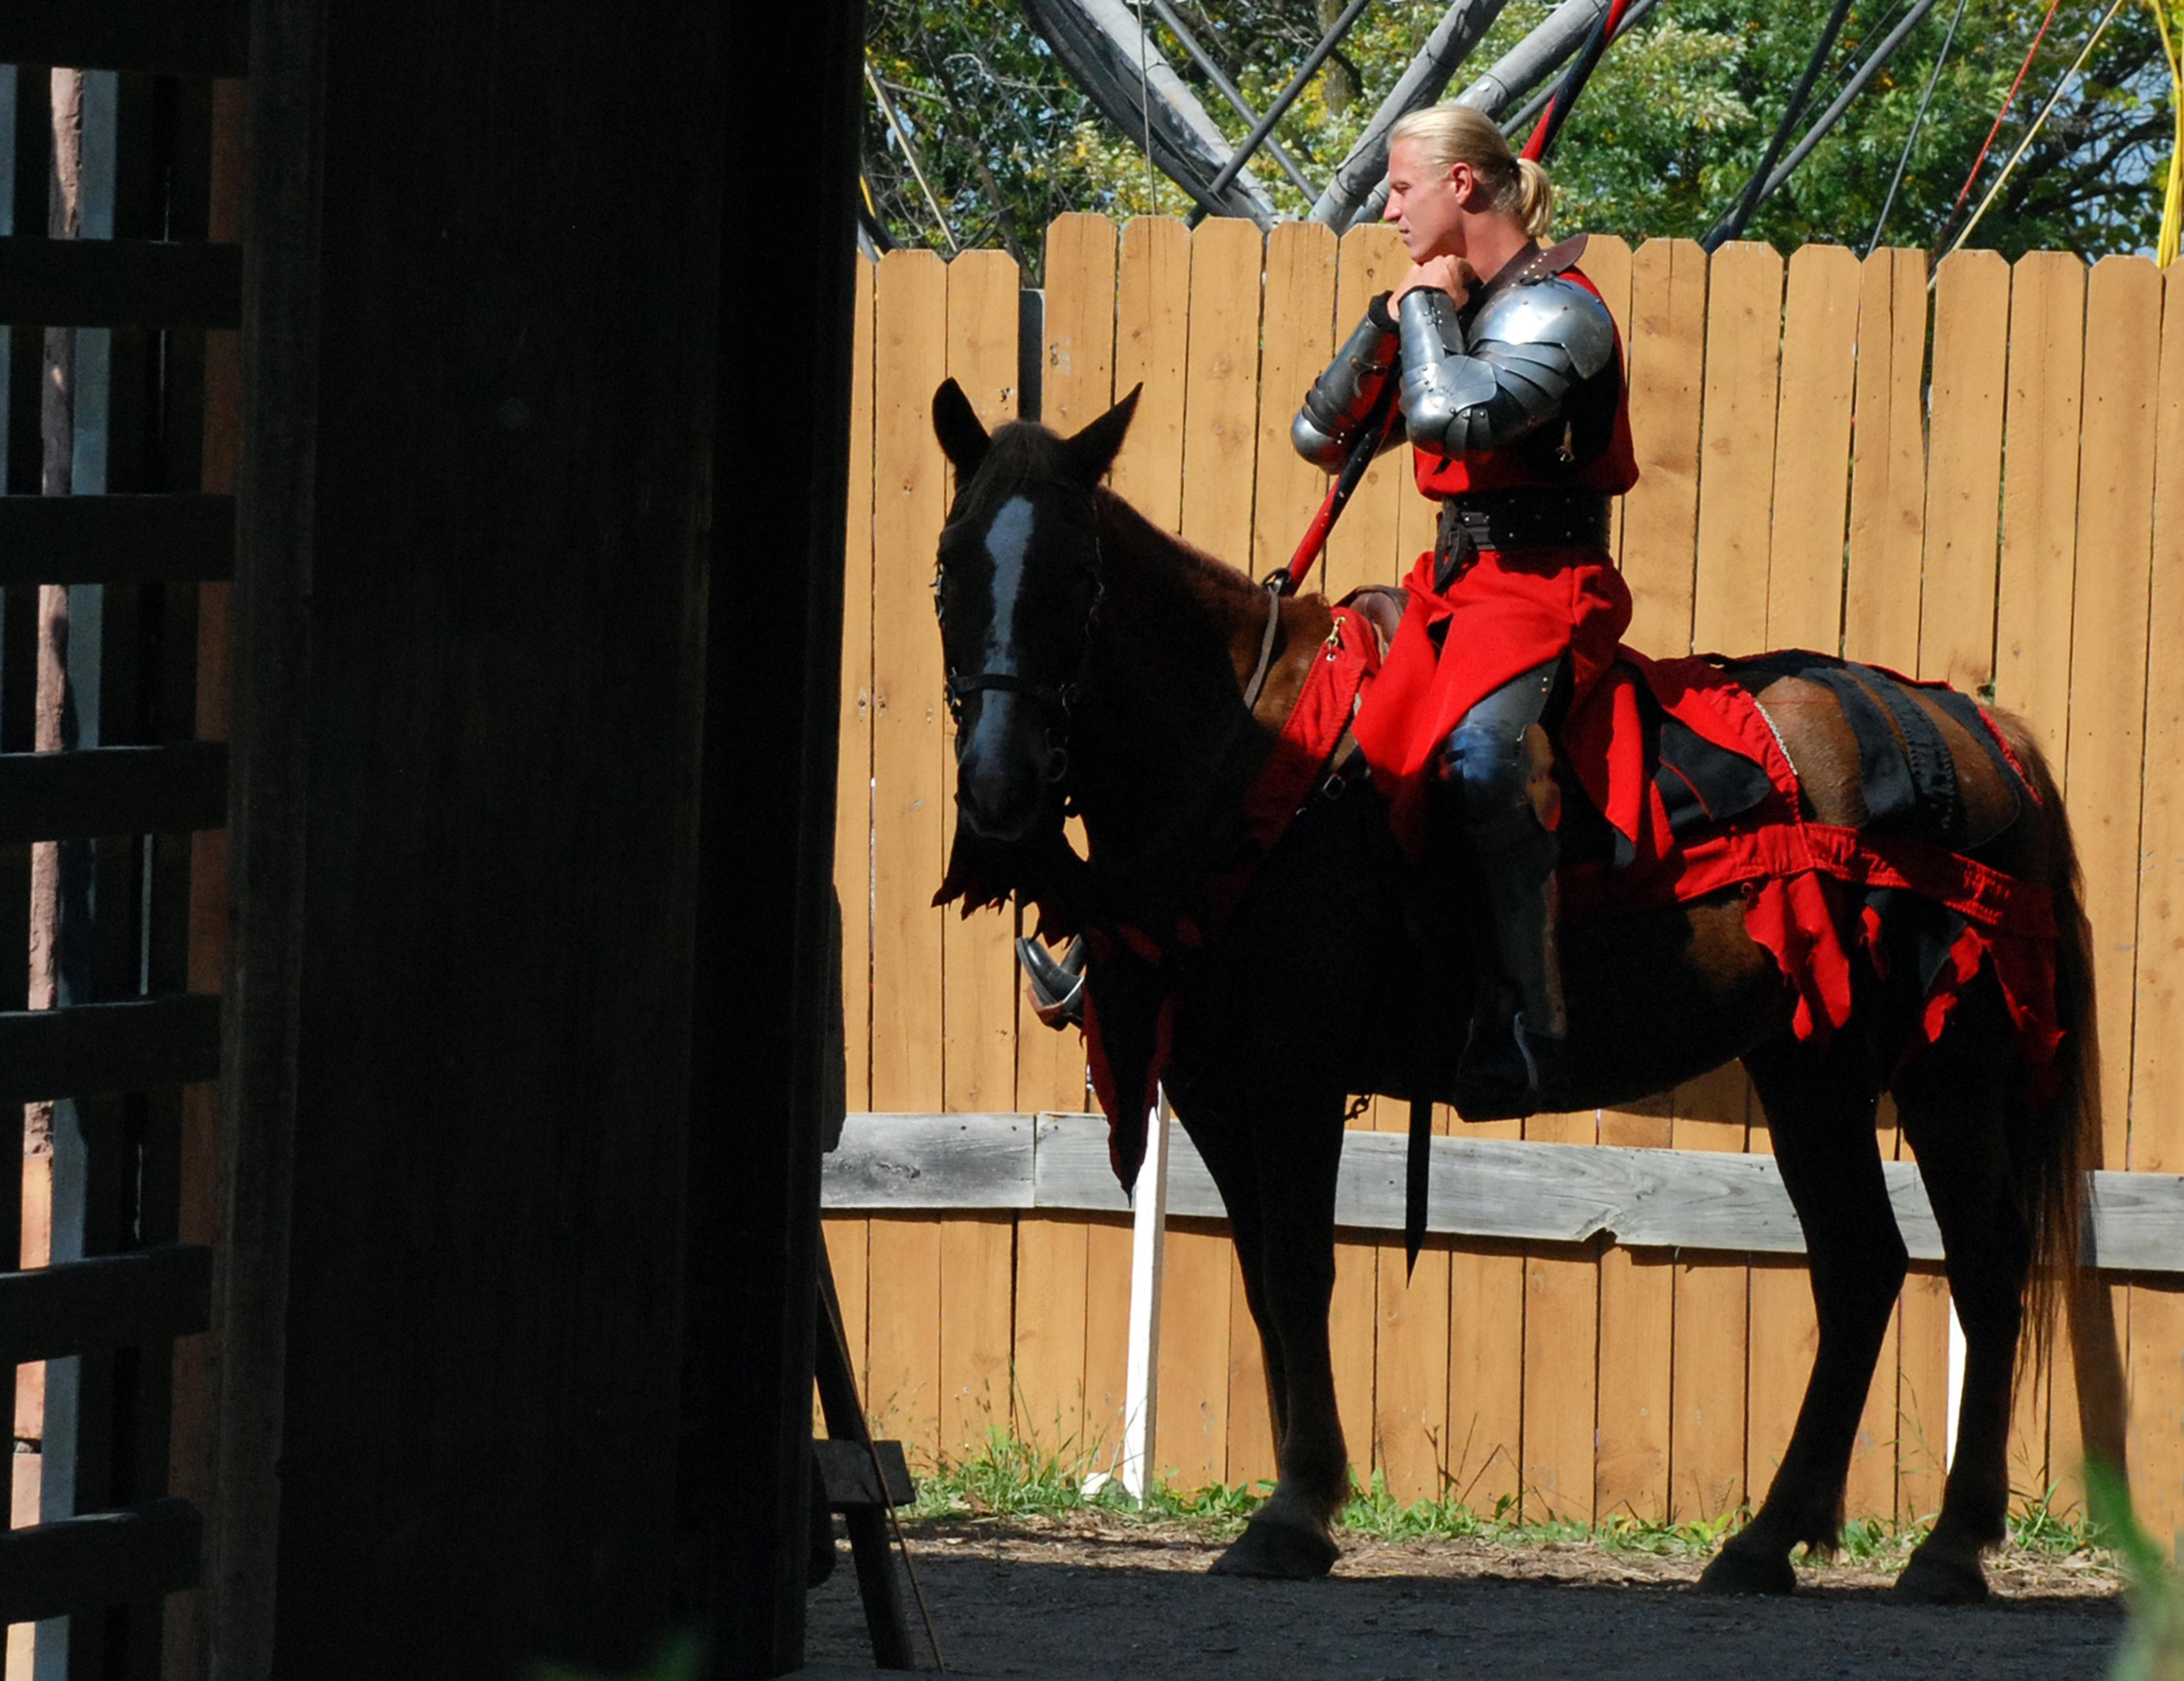 man horseback horse stallion riding medieval knight history jockey costume armour equestrianism horse like mammal english & Free Images : man horseback stallion medieval knight history ...